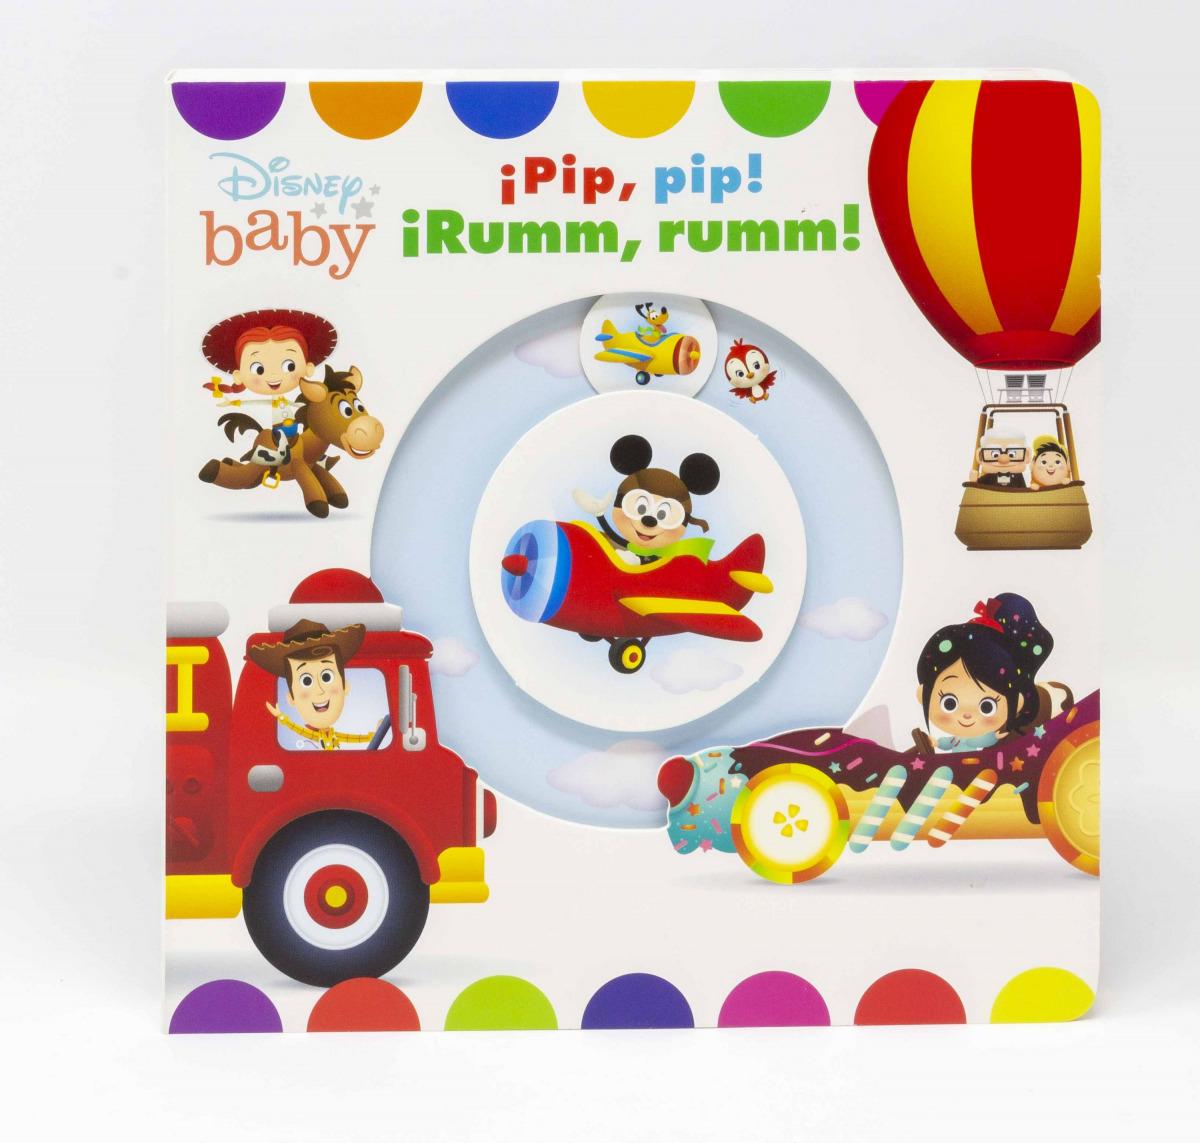 Disney Baby. ¡Pip, pip! ¡Rumm, rumm!